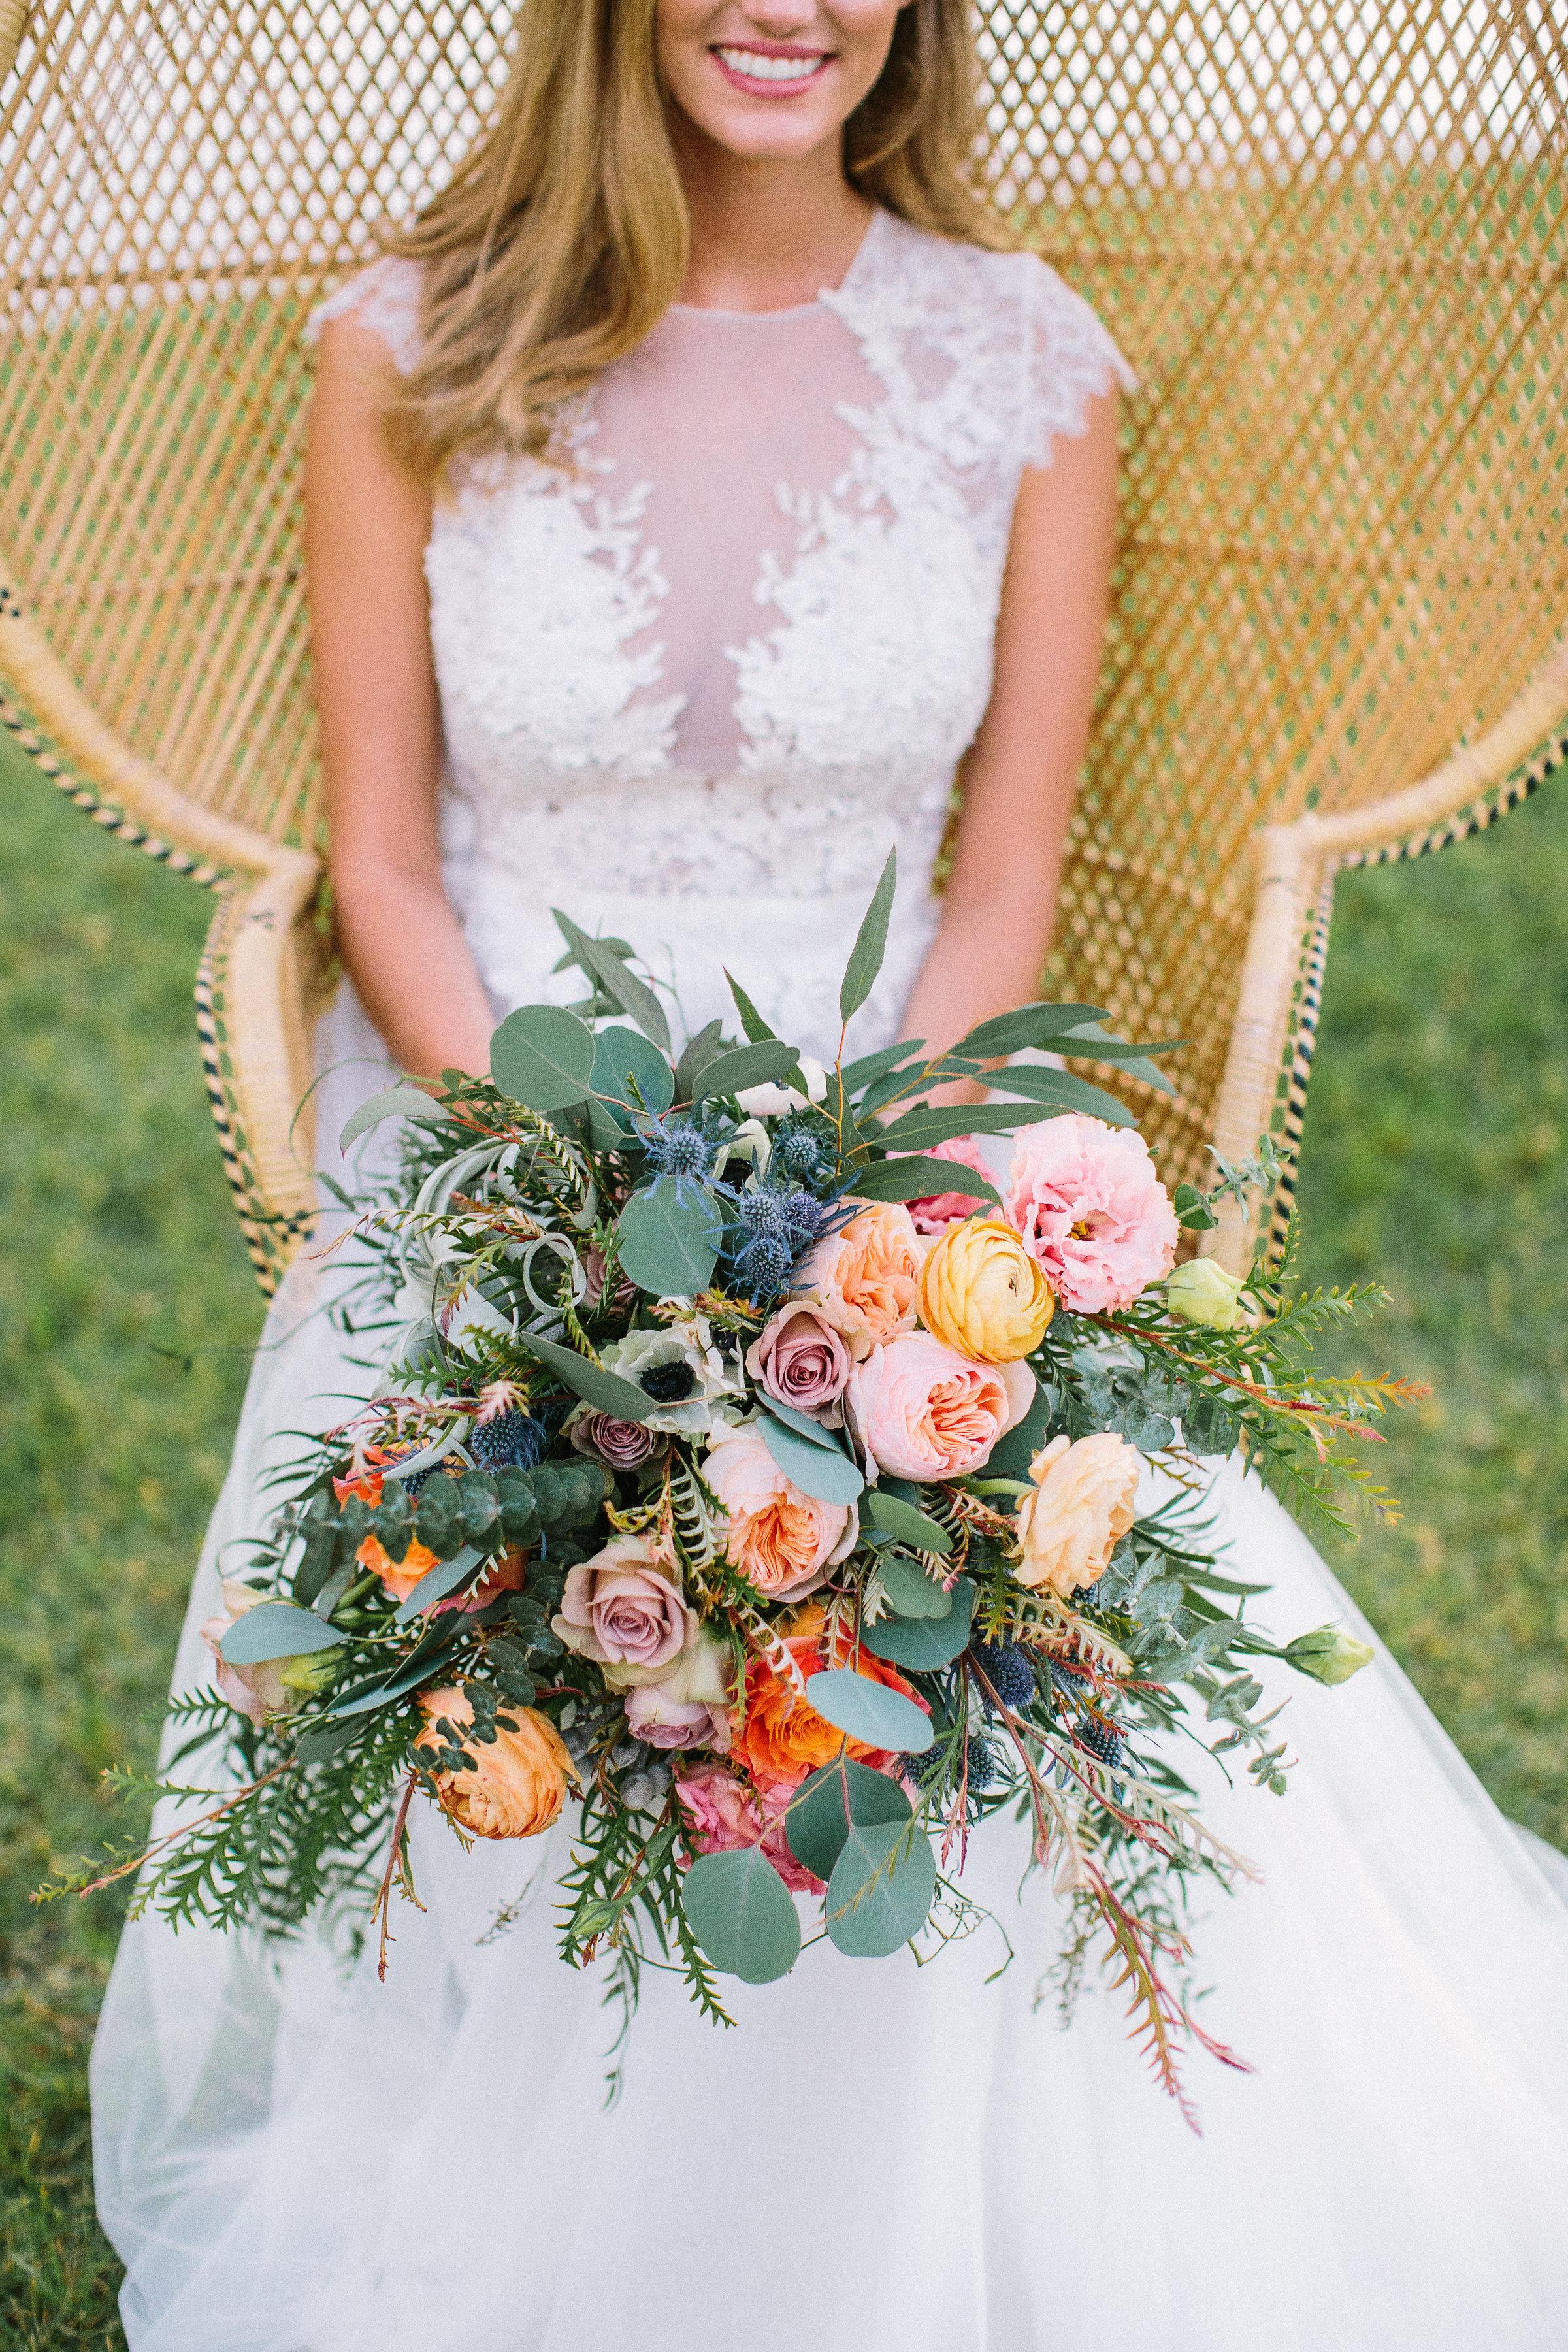 Ellen-Ashton-Photography-Peach-Creek-Ranch-Weddings-Wed-and-Prosper399